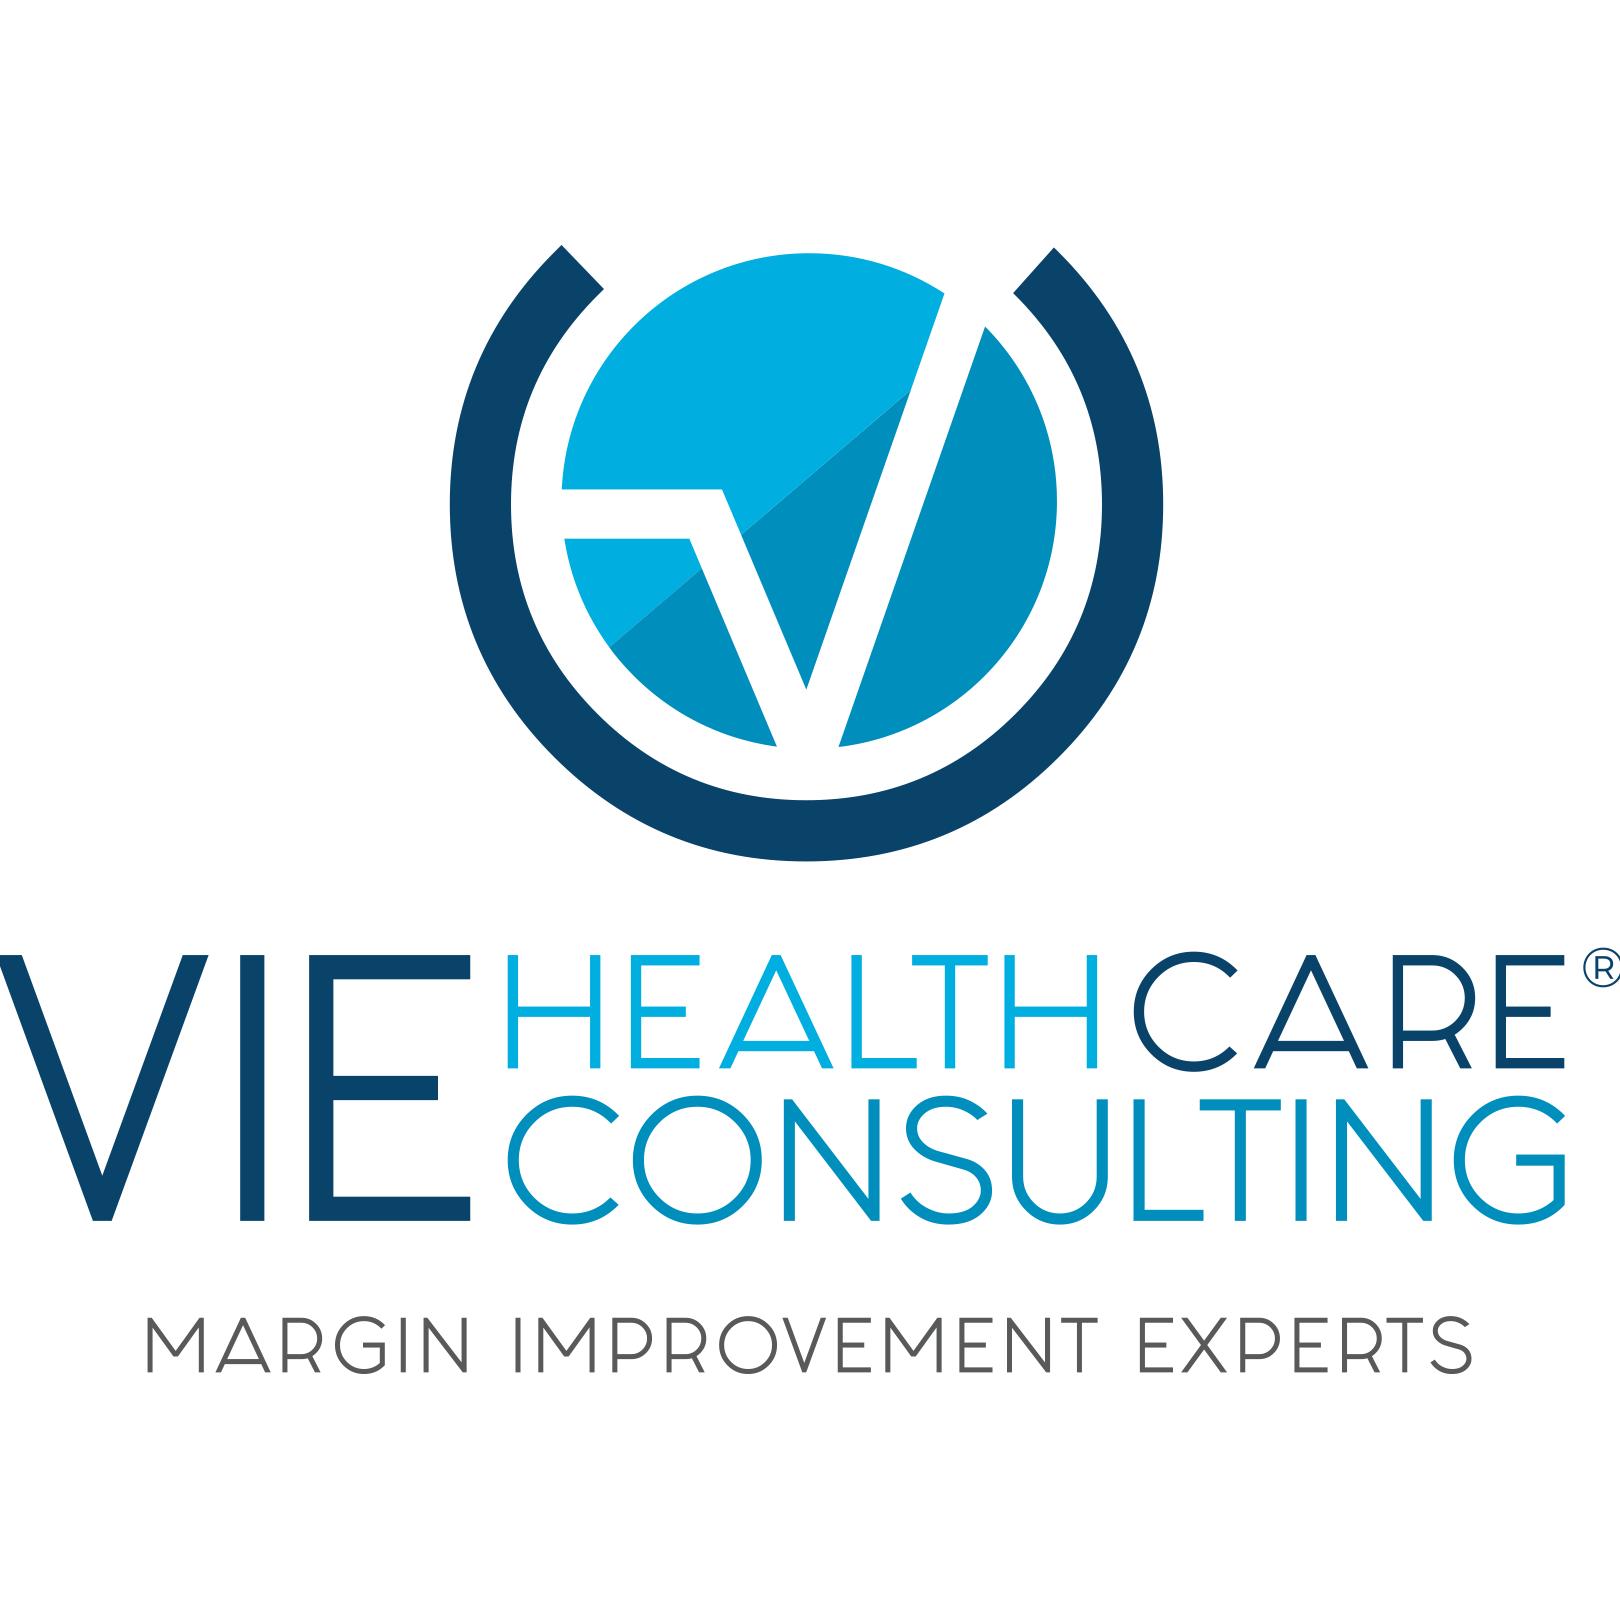 VIE Healthcare Consulting